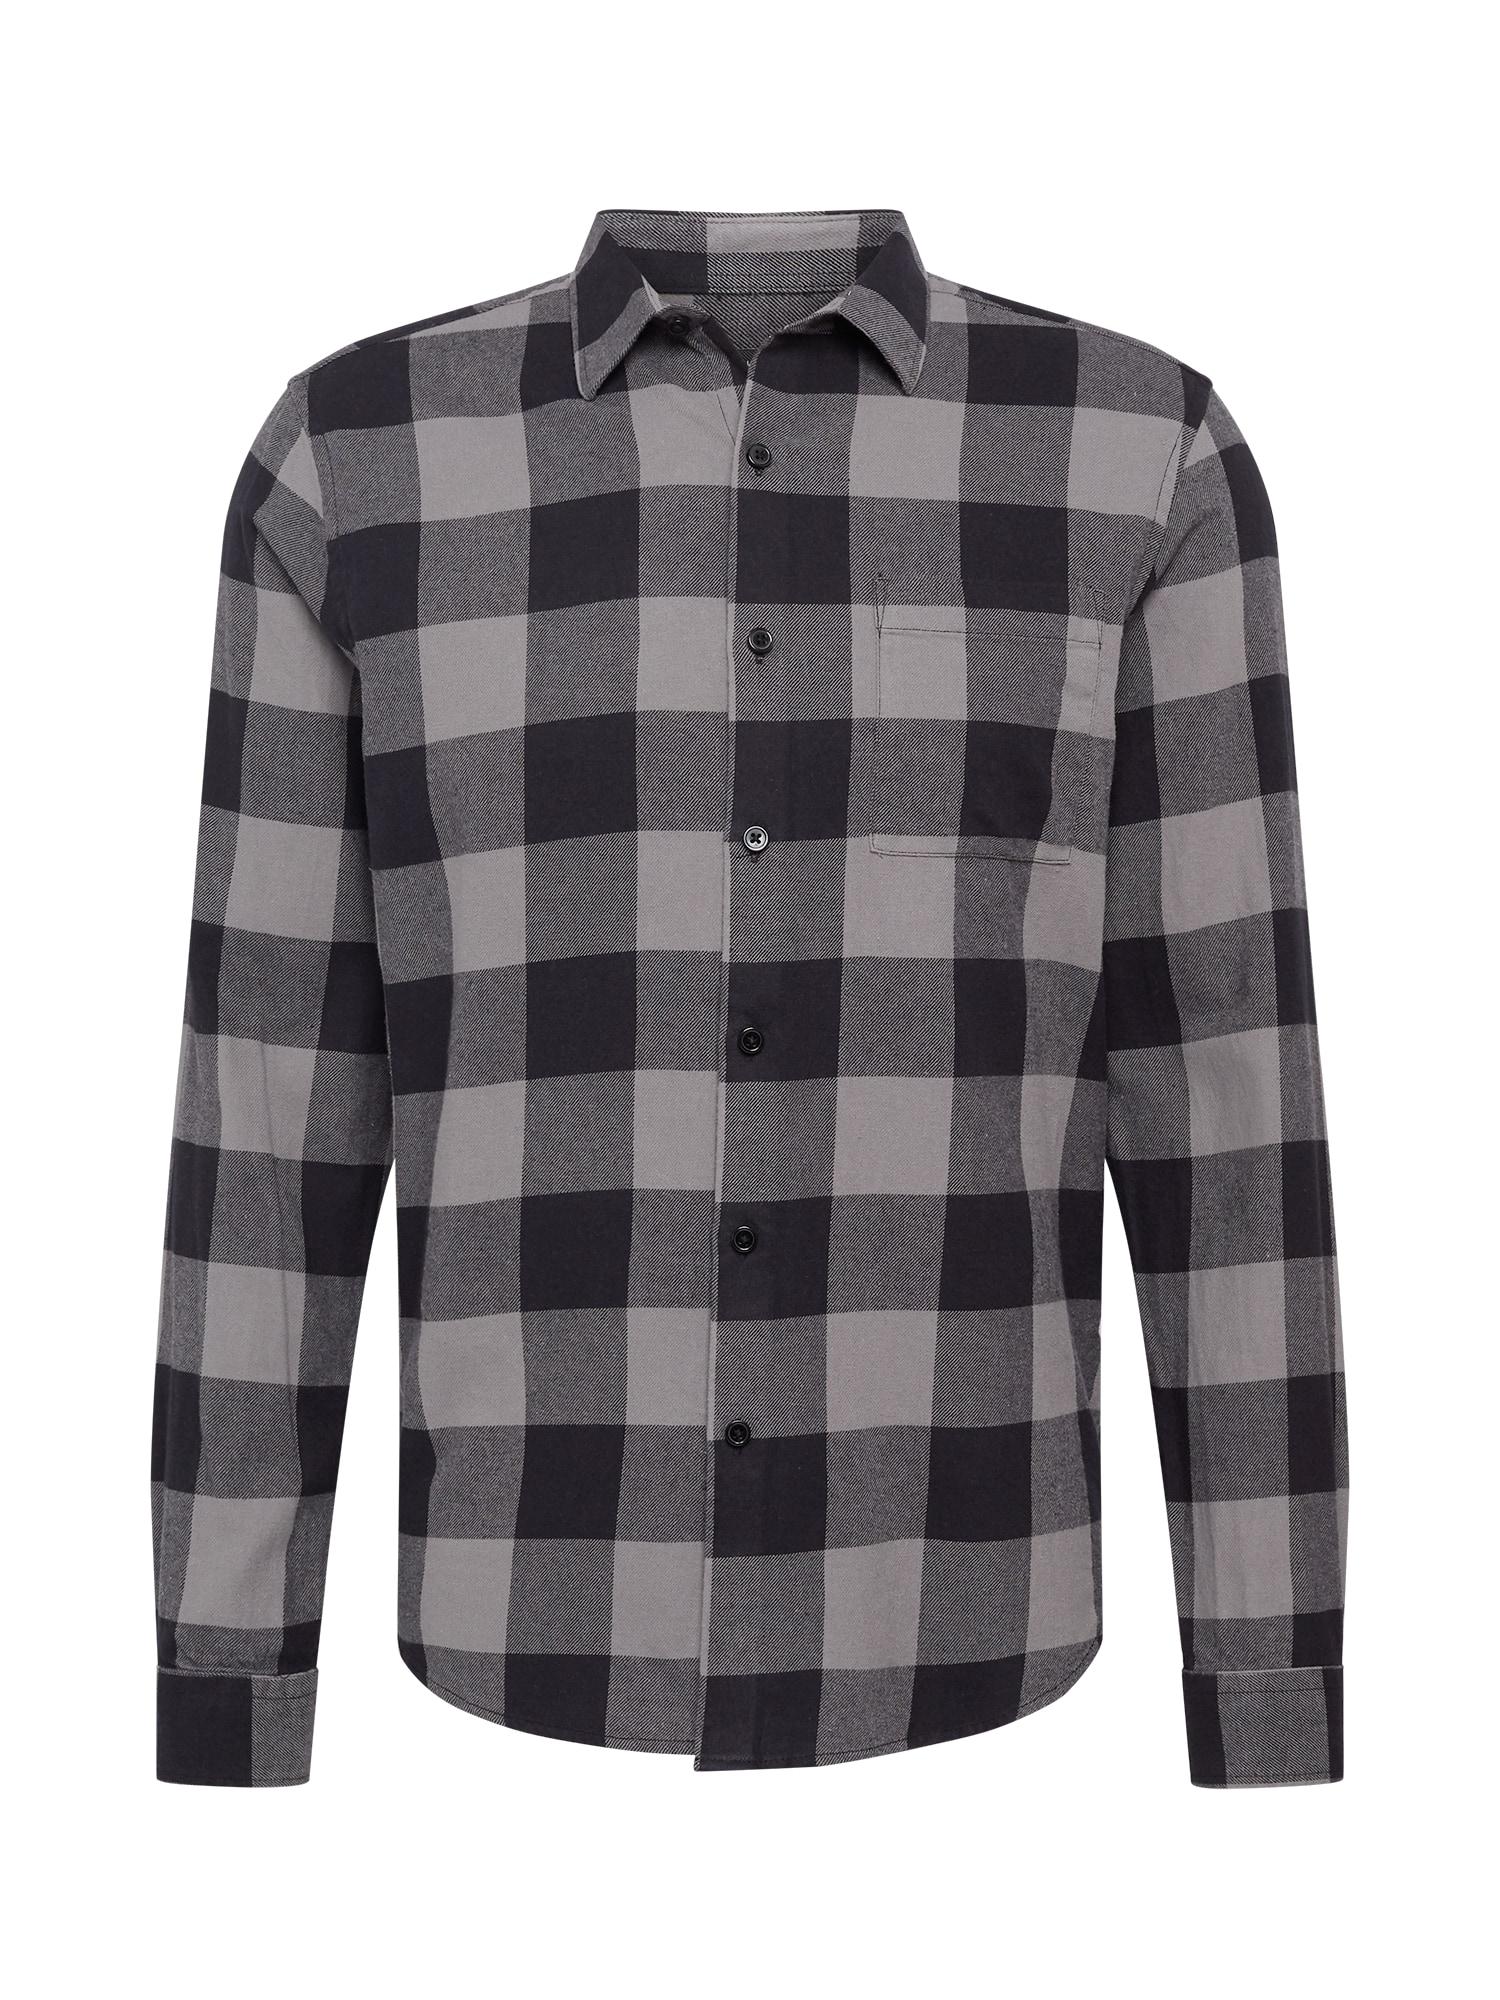 NEW LOOK Marškiniai pilka